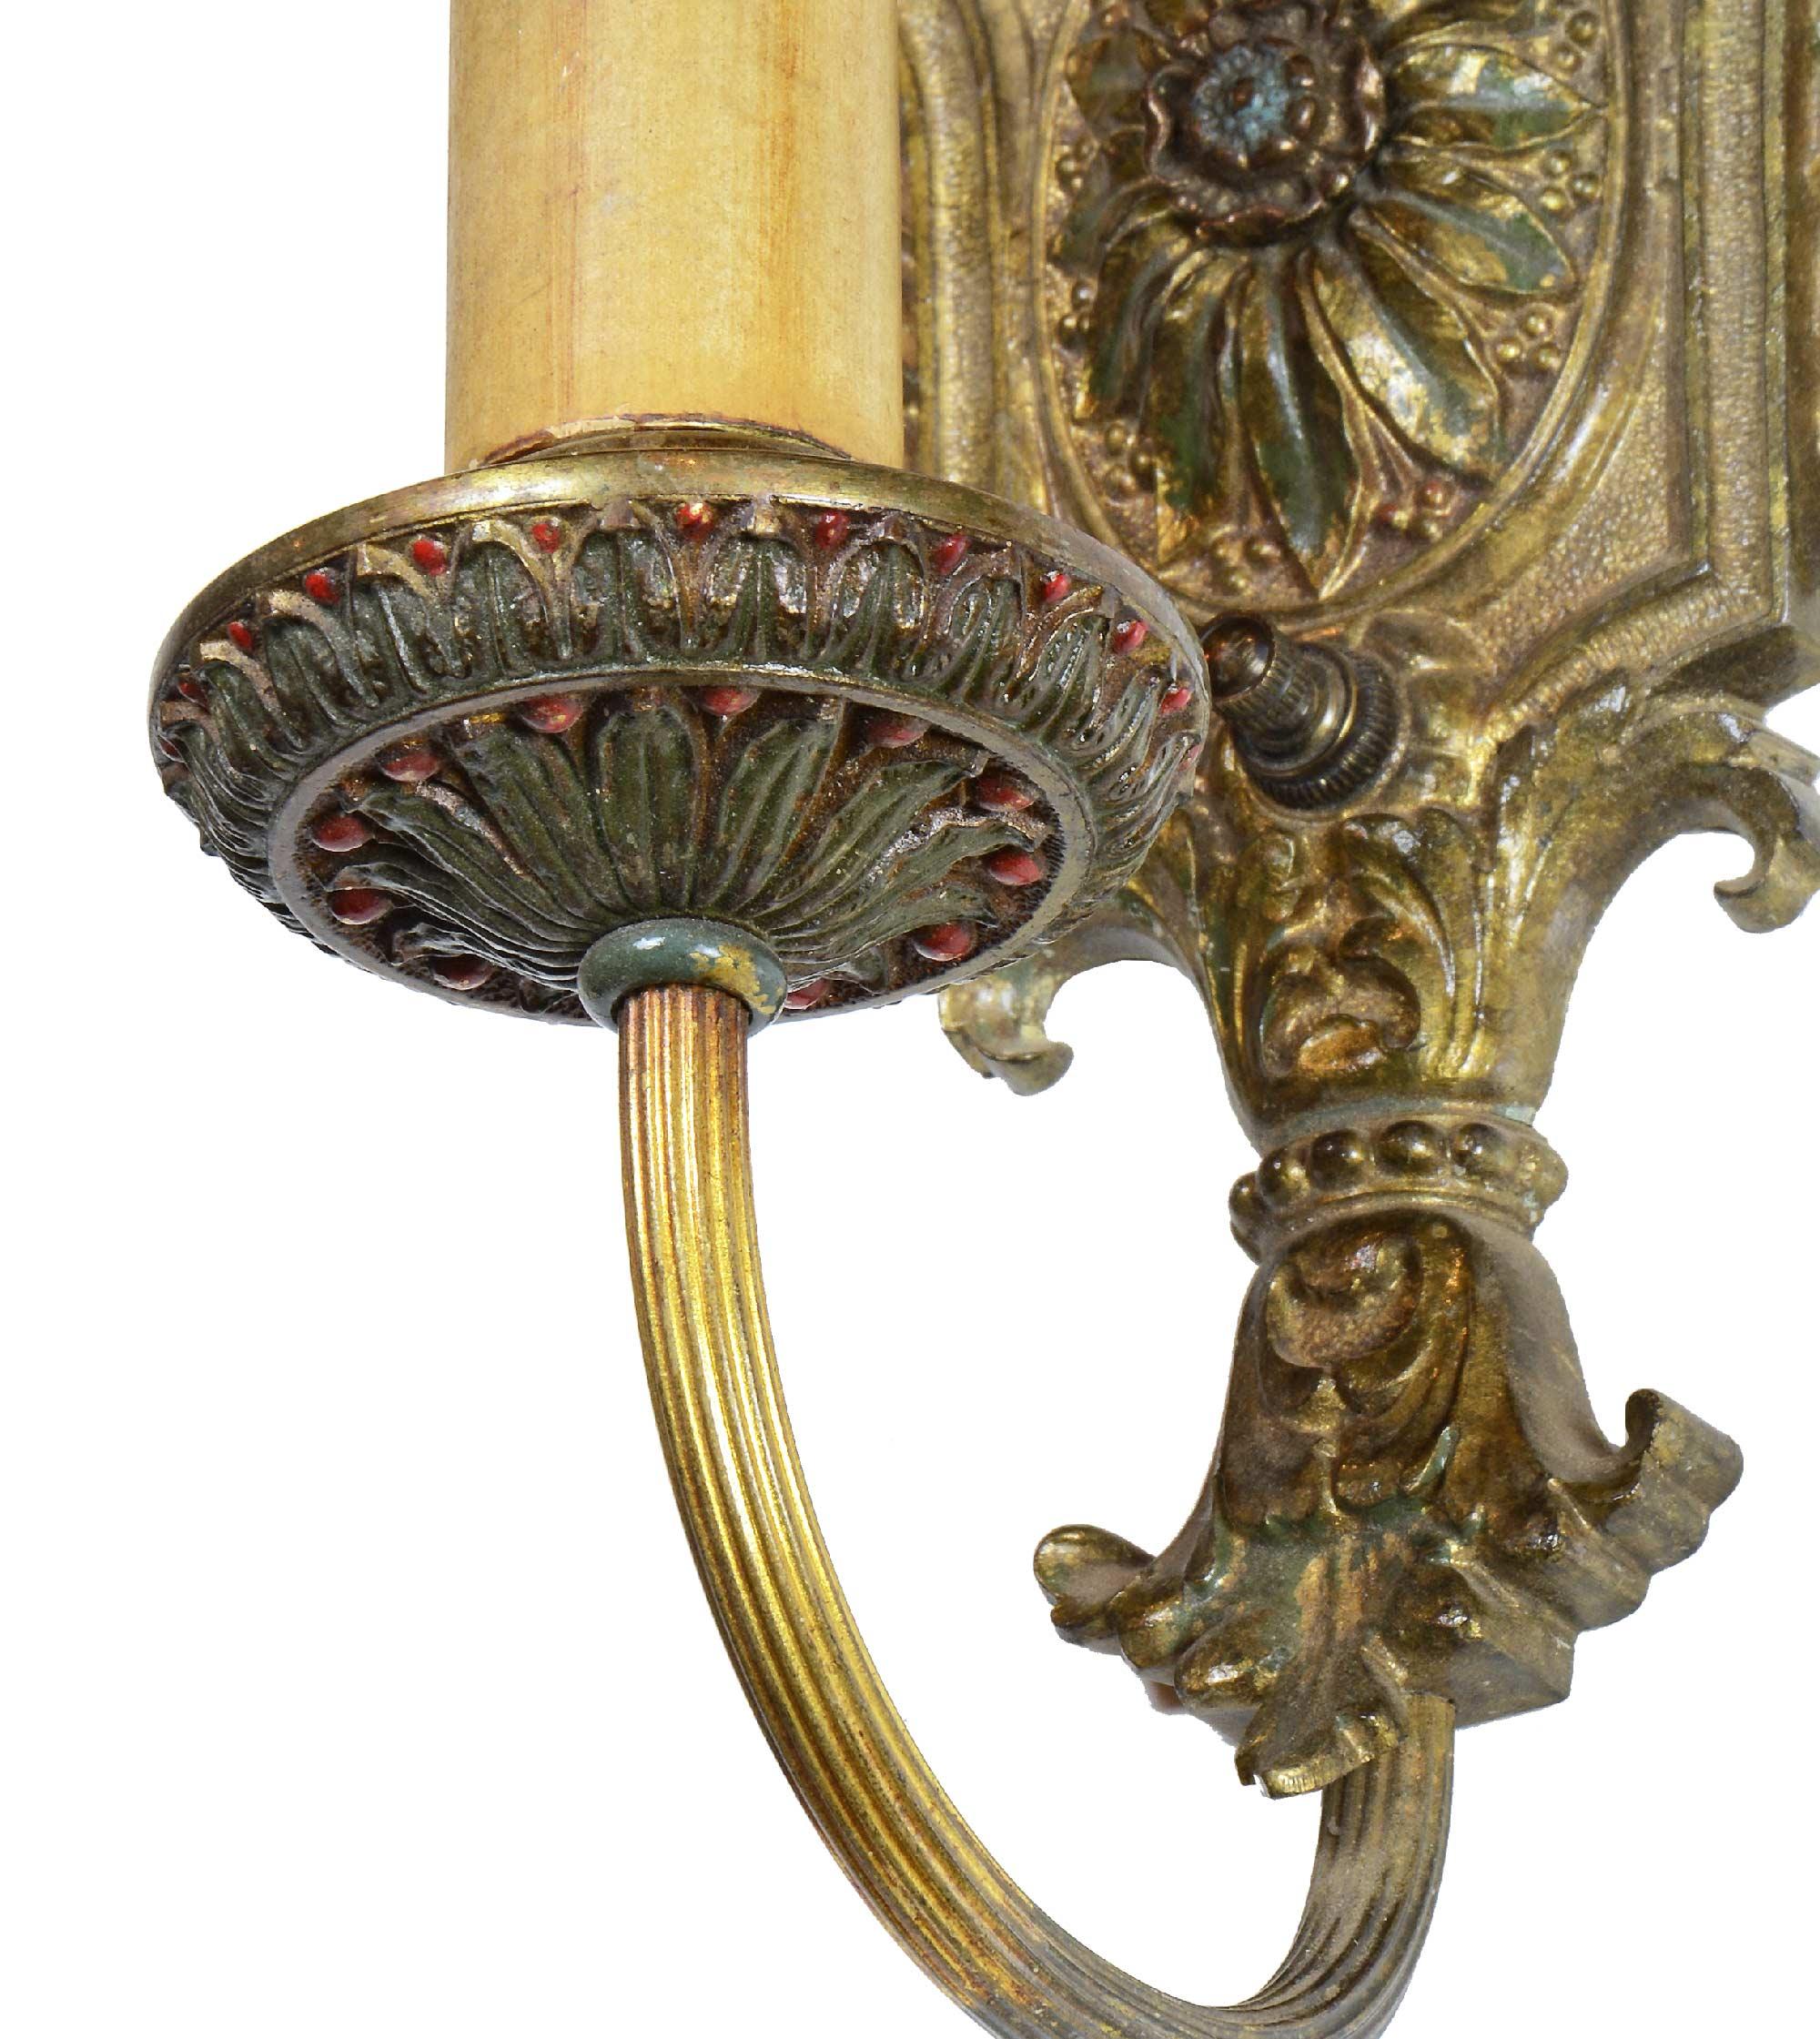 39649-beax-arts-painted-floral-cast-brass-sconce-bobeche.jpg